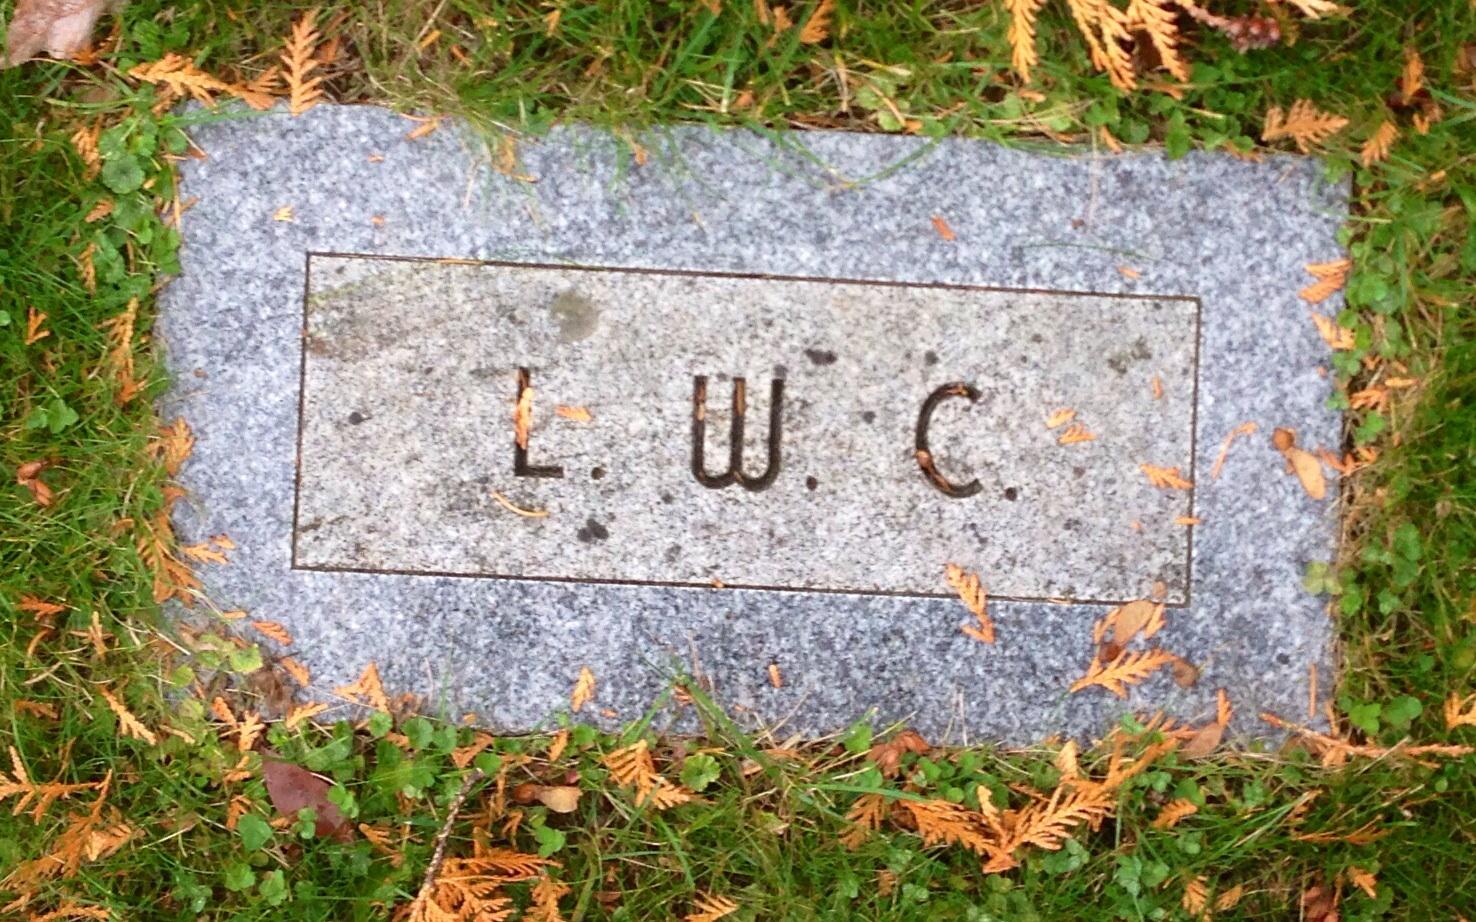 Lucian West Chaney, Sr